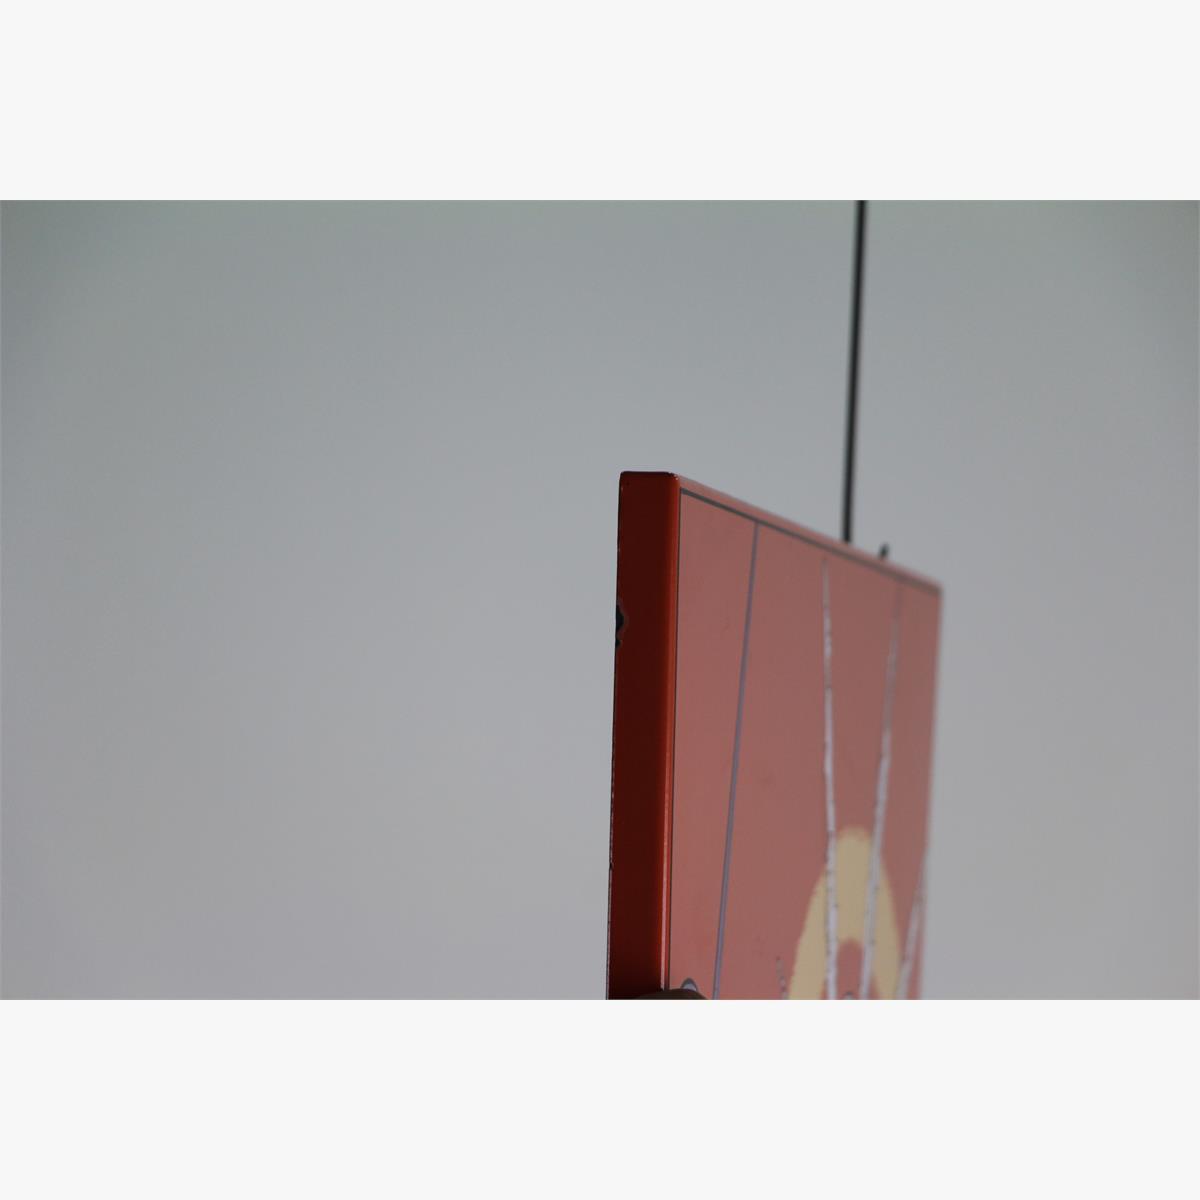 "Afbeeldingen van emaille bord blake & mortimer uit de valstreek 2010  oplage 99 ex plaque émaille blake & mortimmer """"le piége diabolique"""""